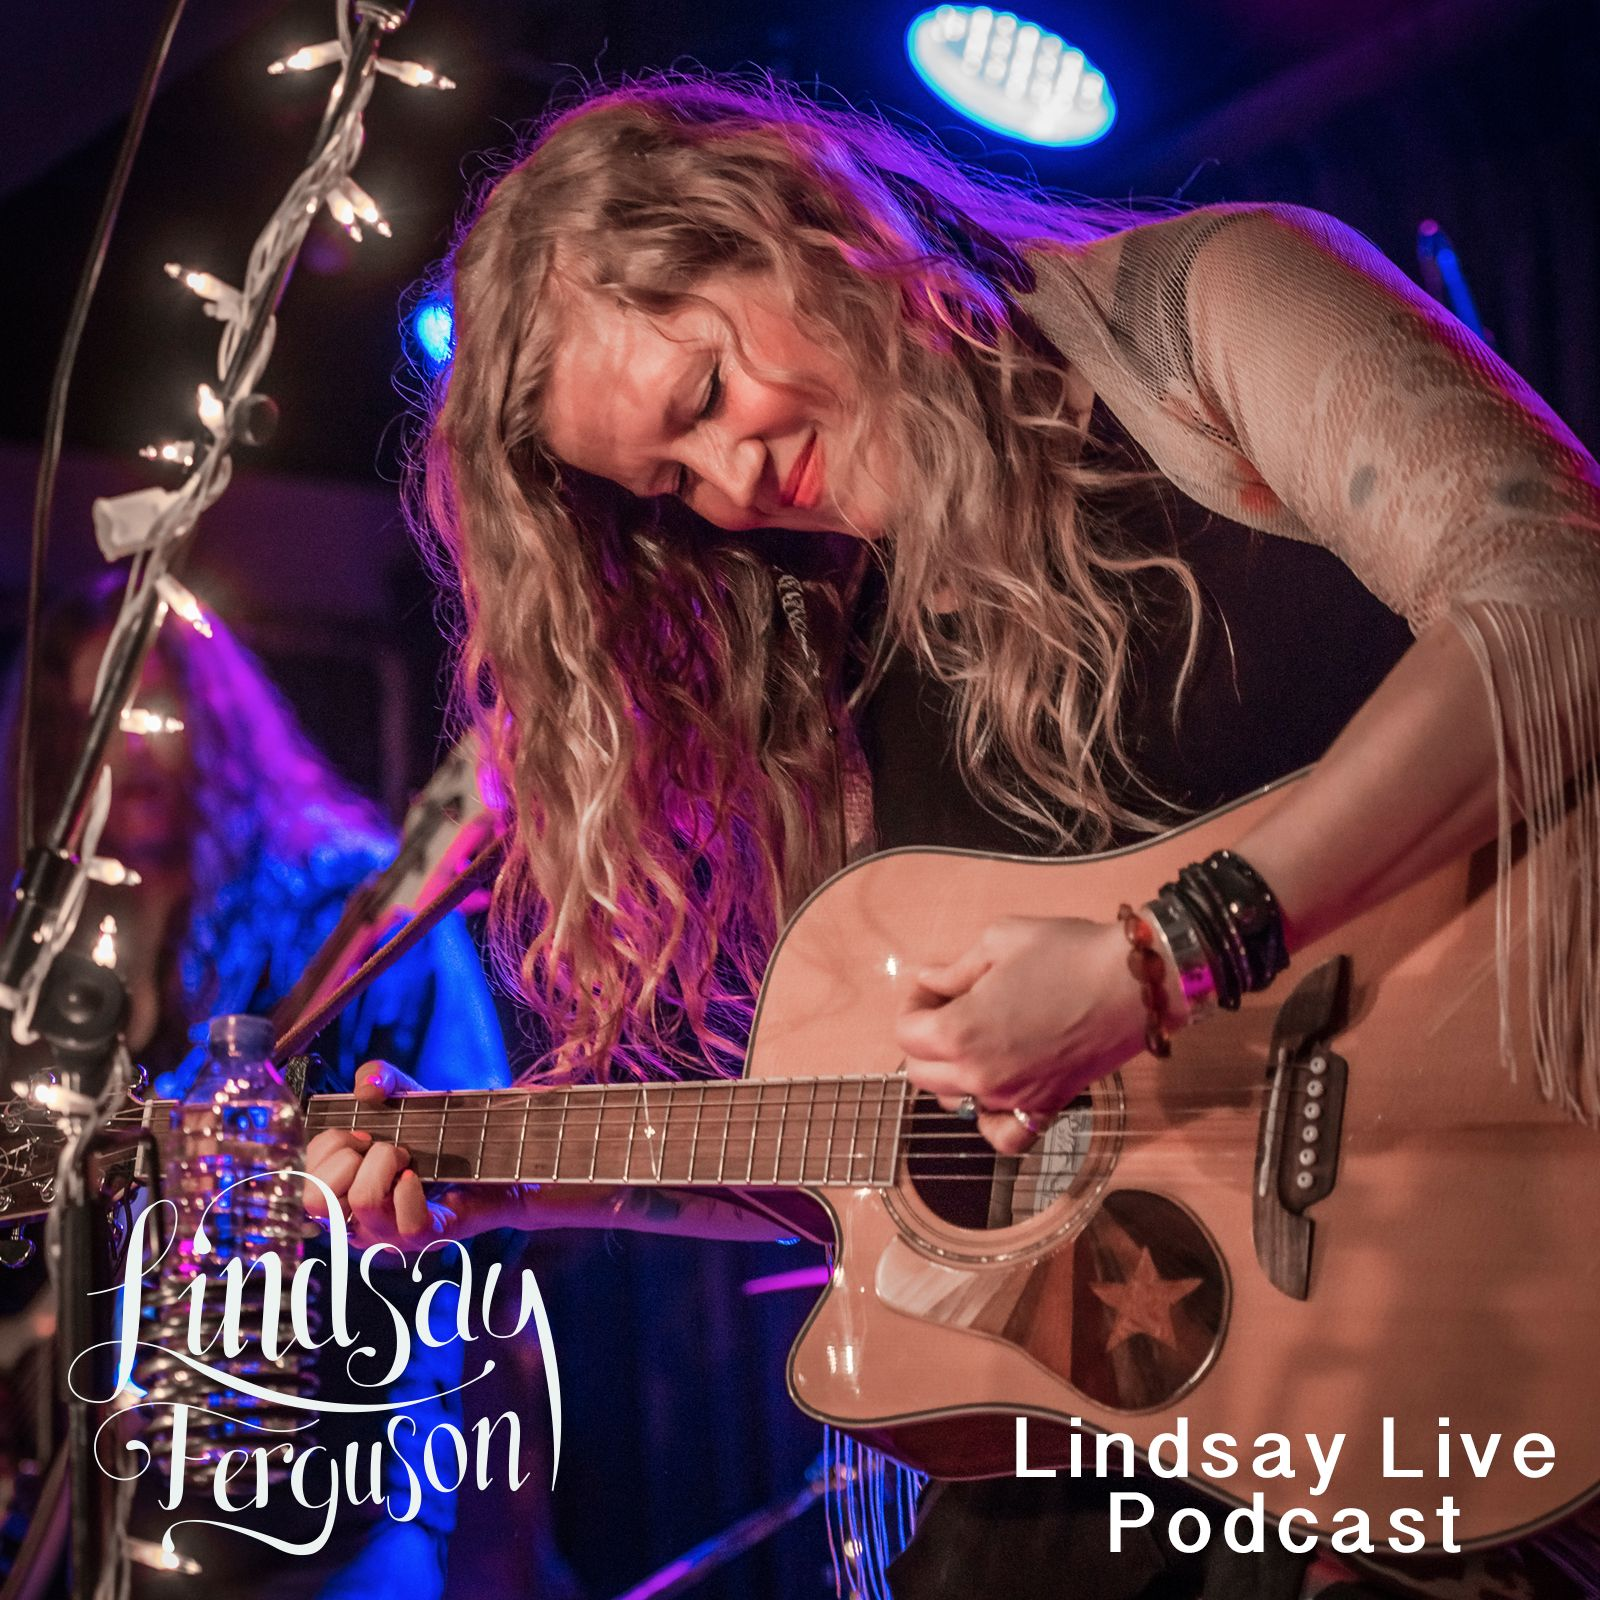 Lindsay Live